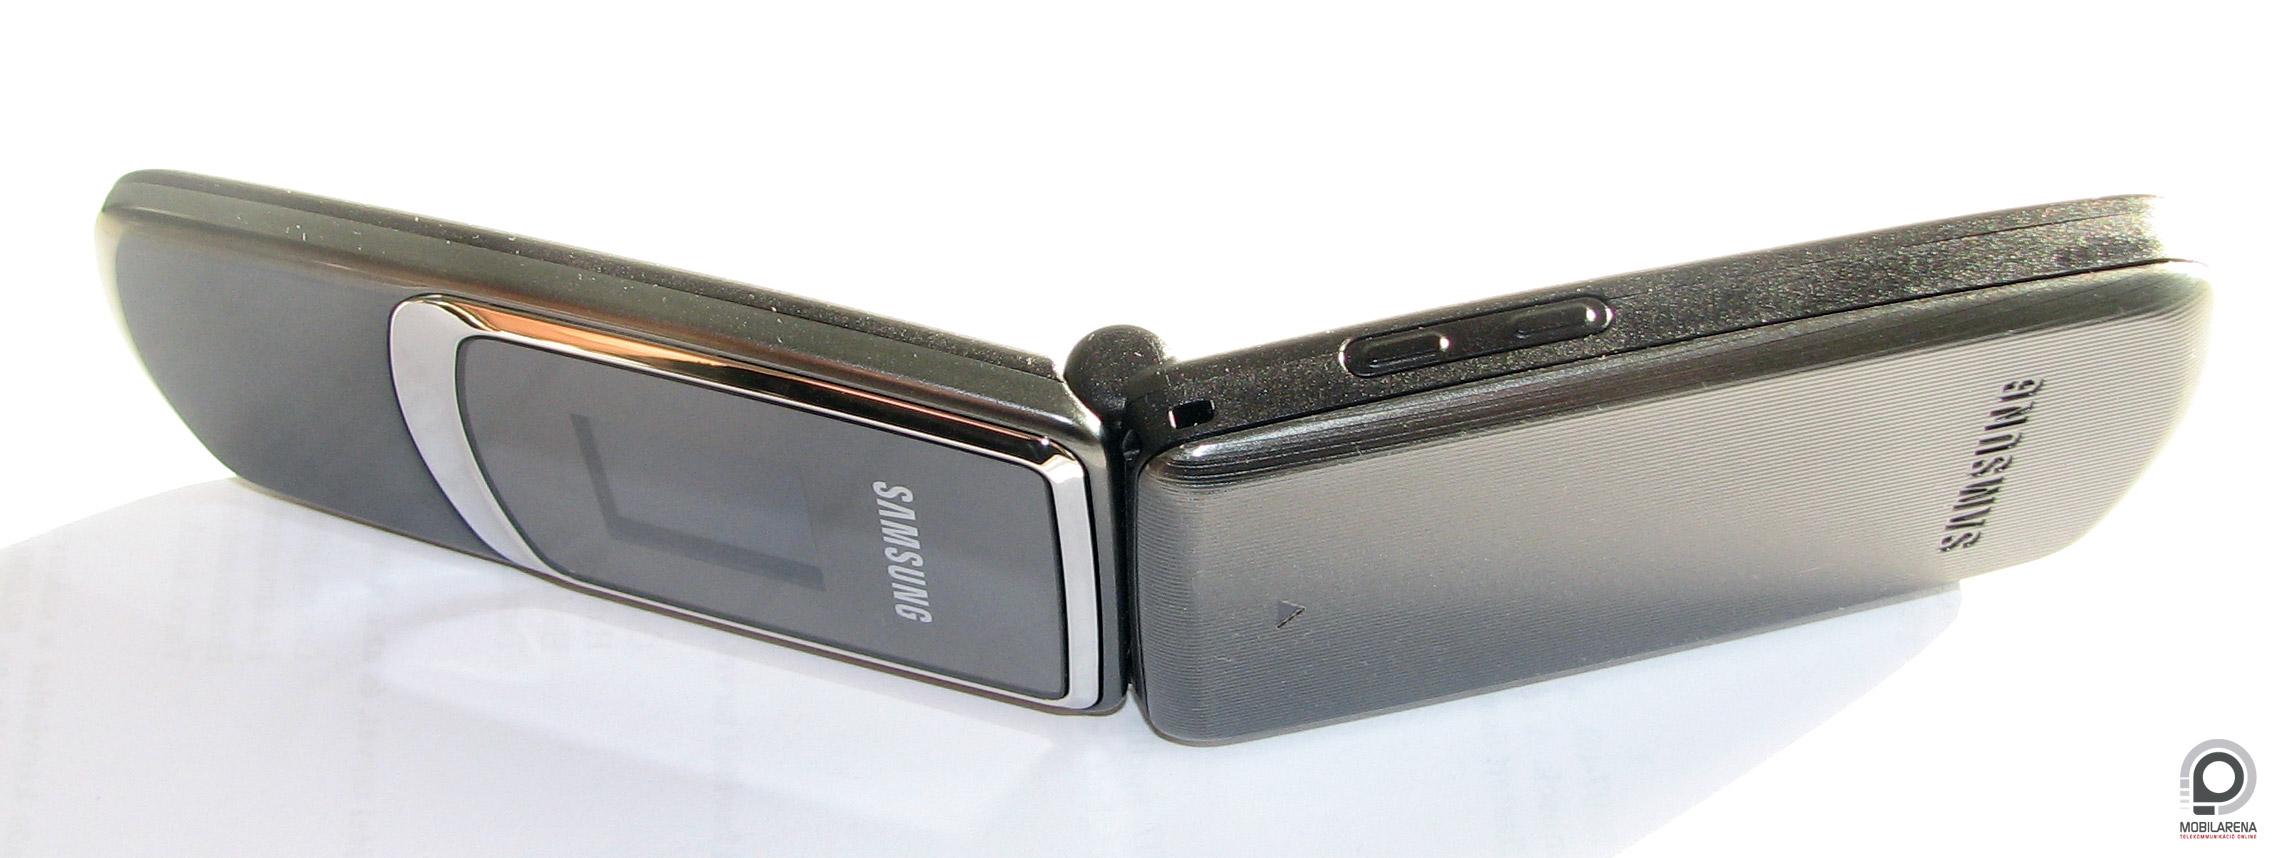 Samsung B320   small guy with nitro   Mobilarena MobileArsenal